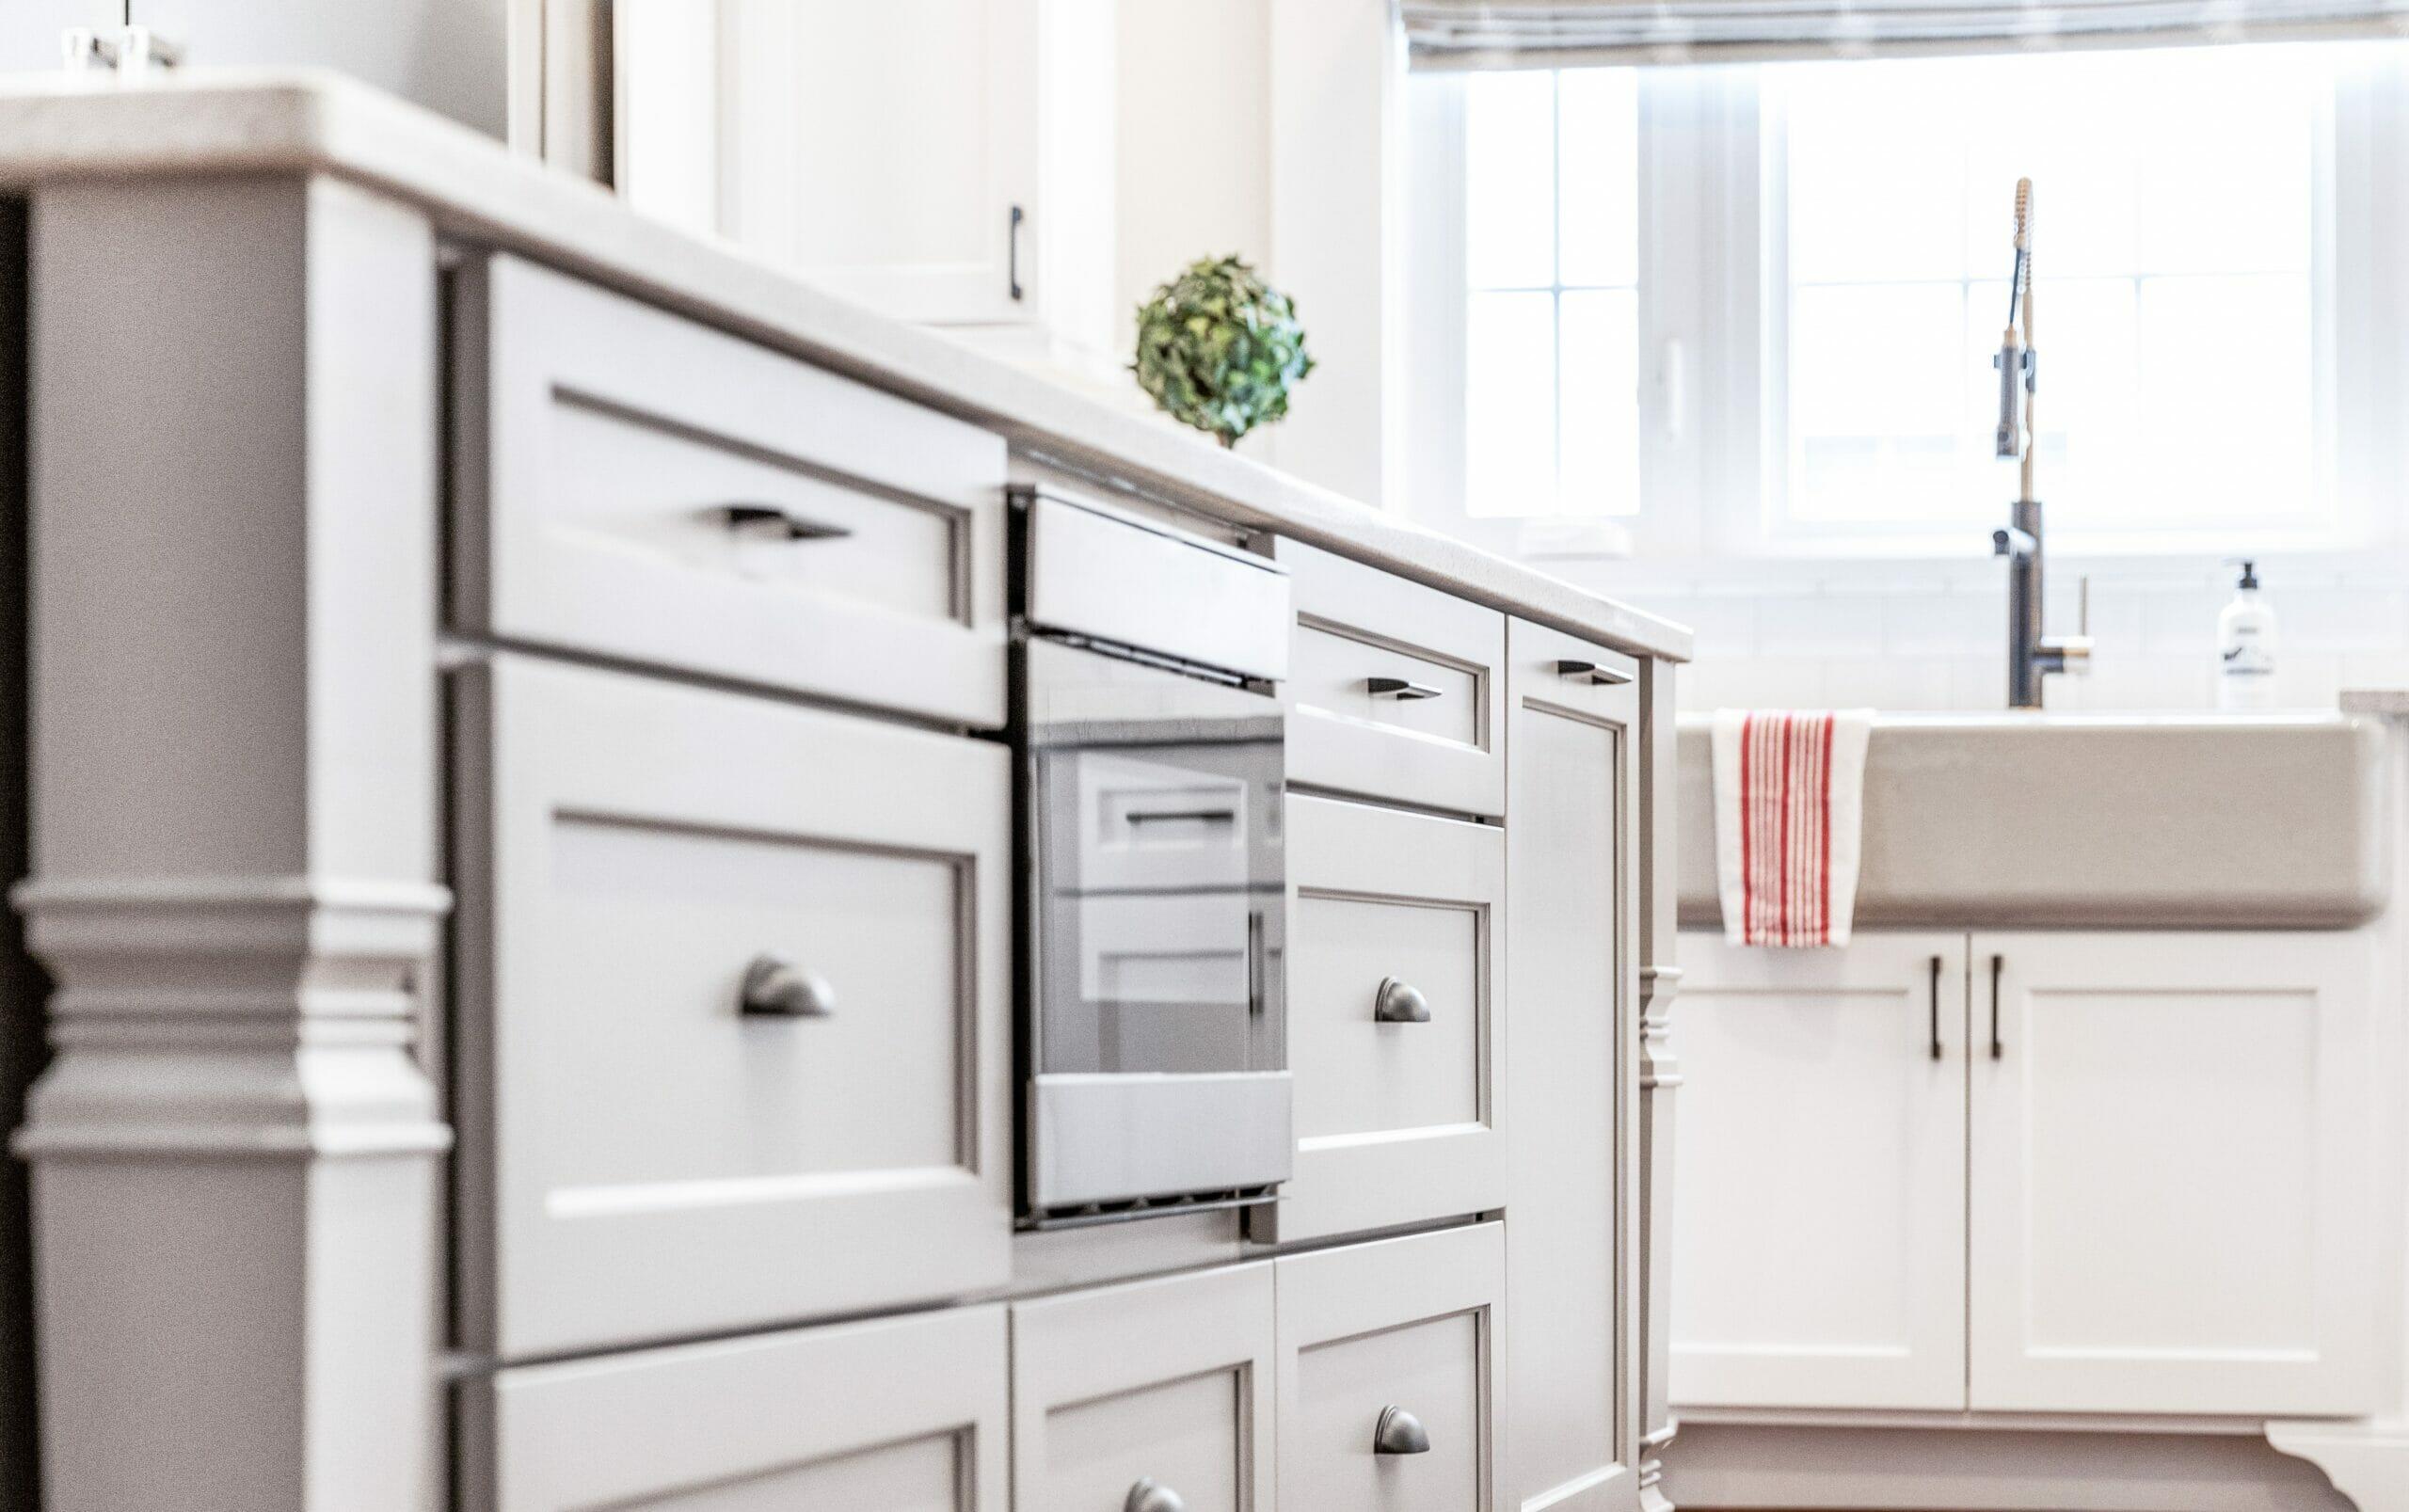 myers-kitchen-4-scaled